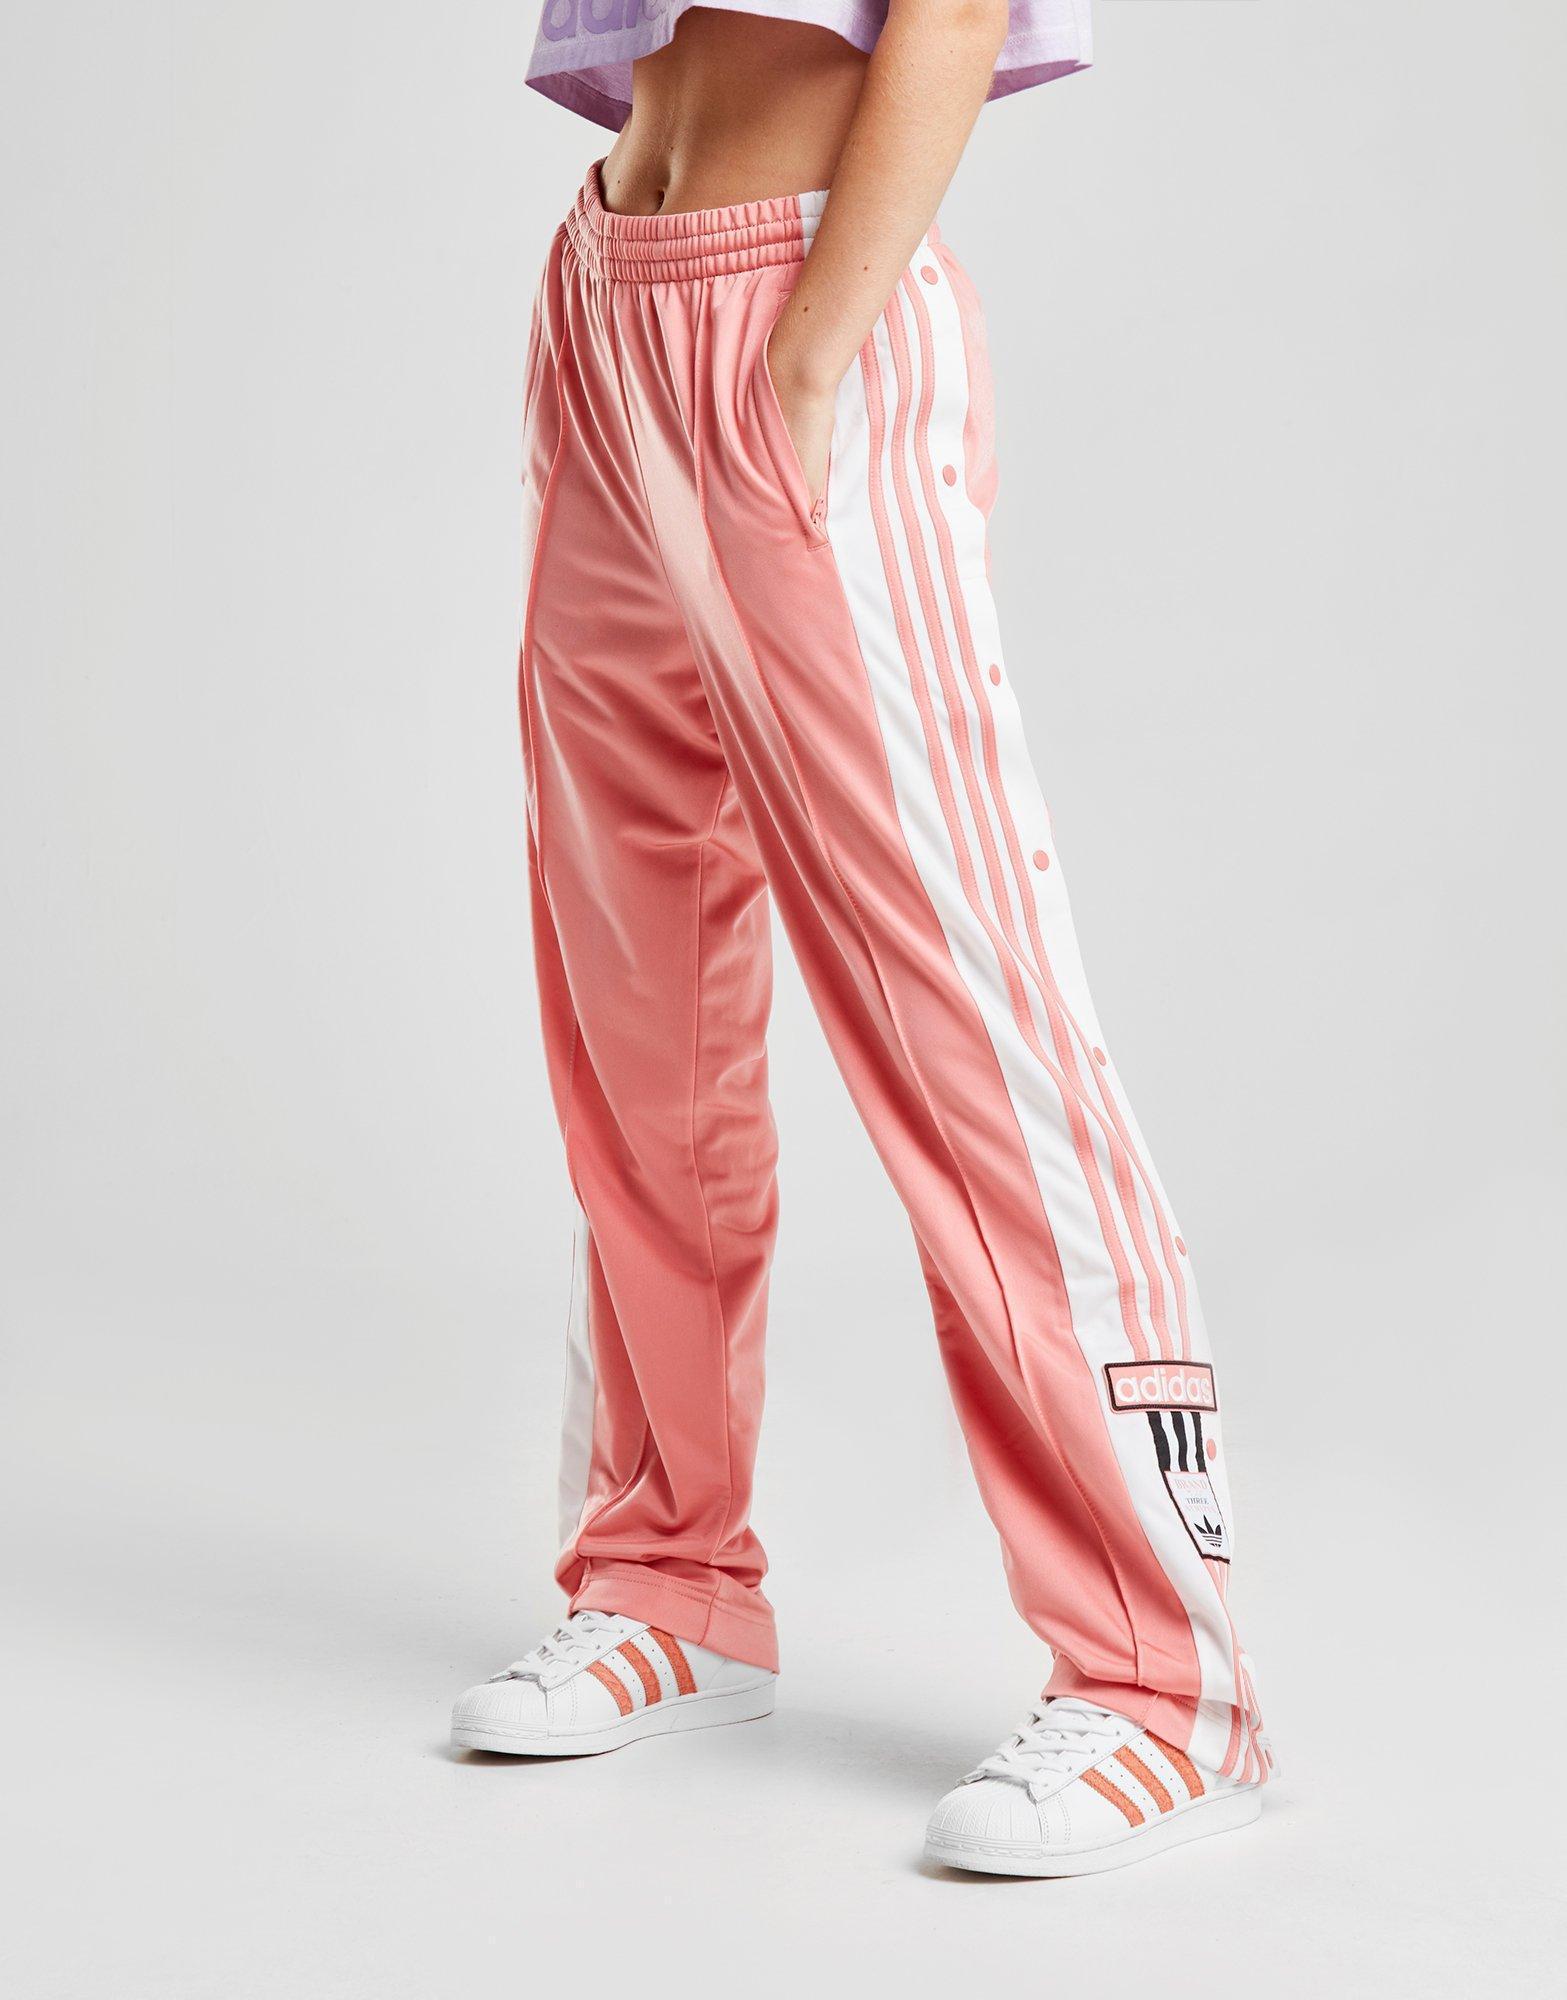 adidas Originals Adibreak Popper Pants in Pink Lyst